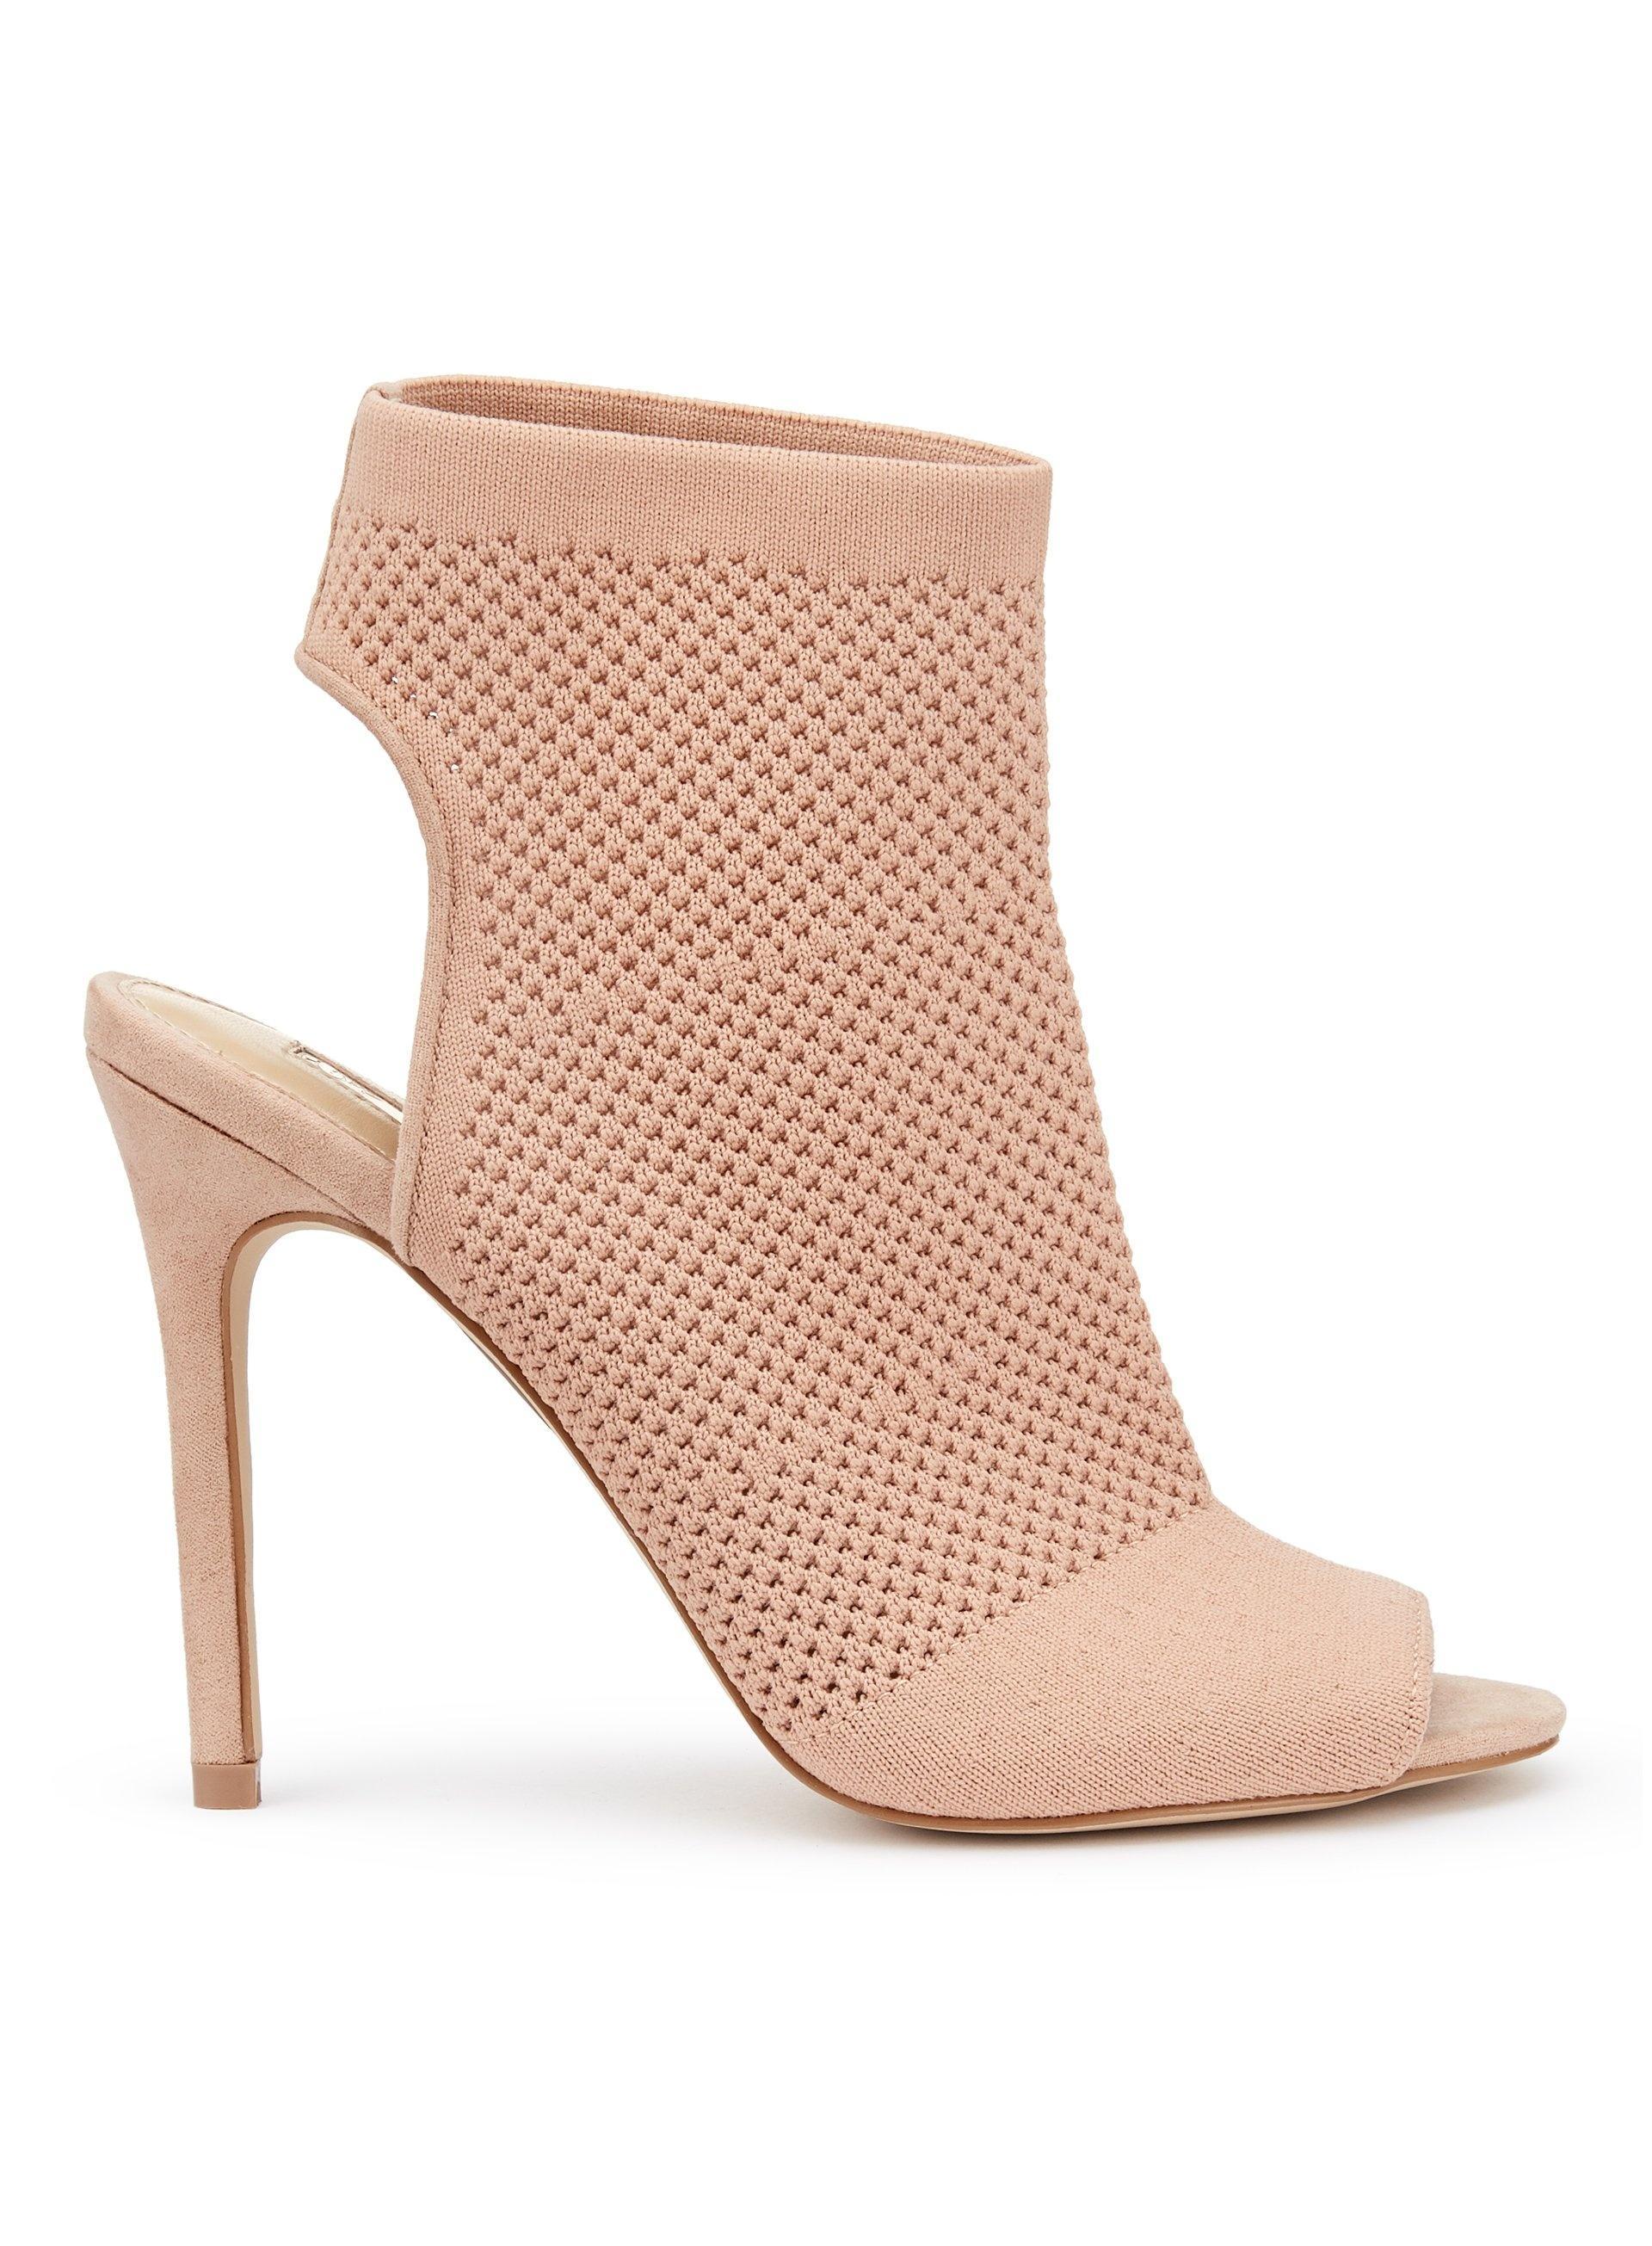 9f04eab6909 Miss Selfridge Pink Nude Candy Knitted Peep Toe Heel Sandals